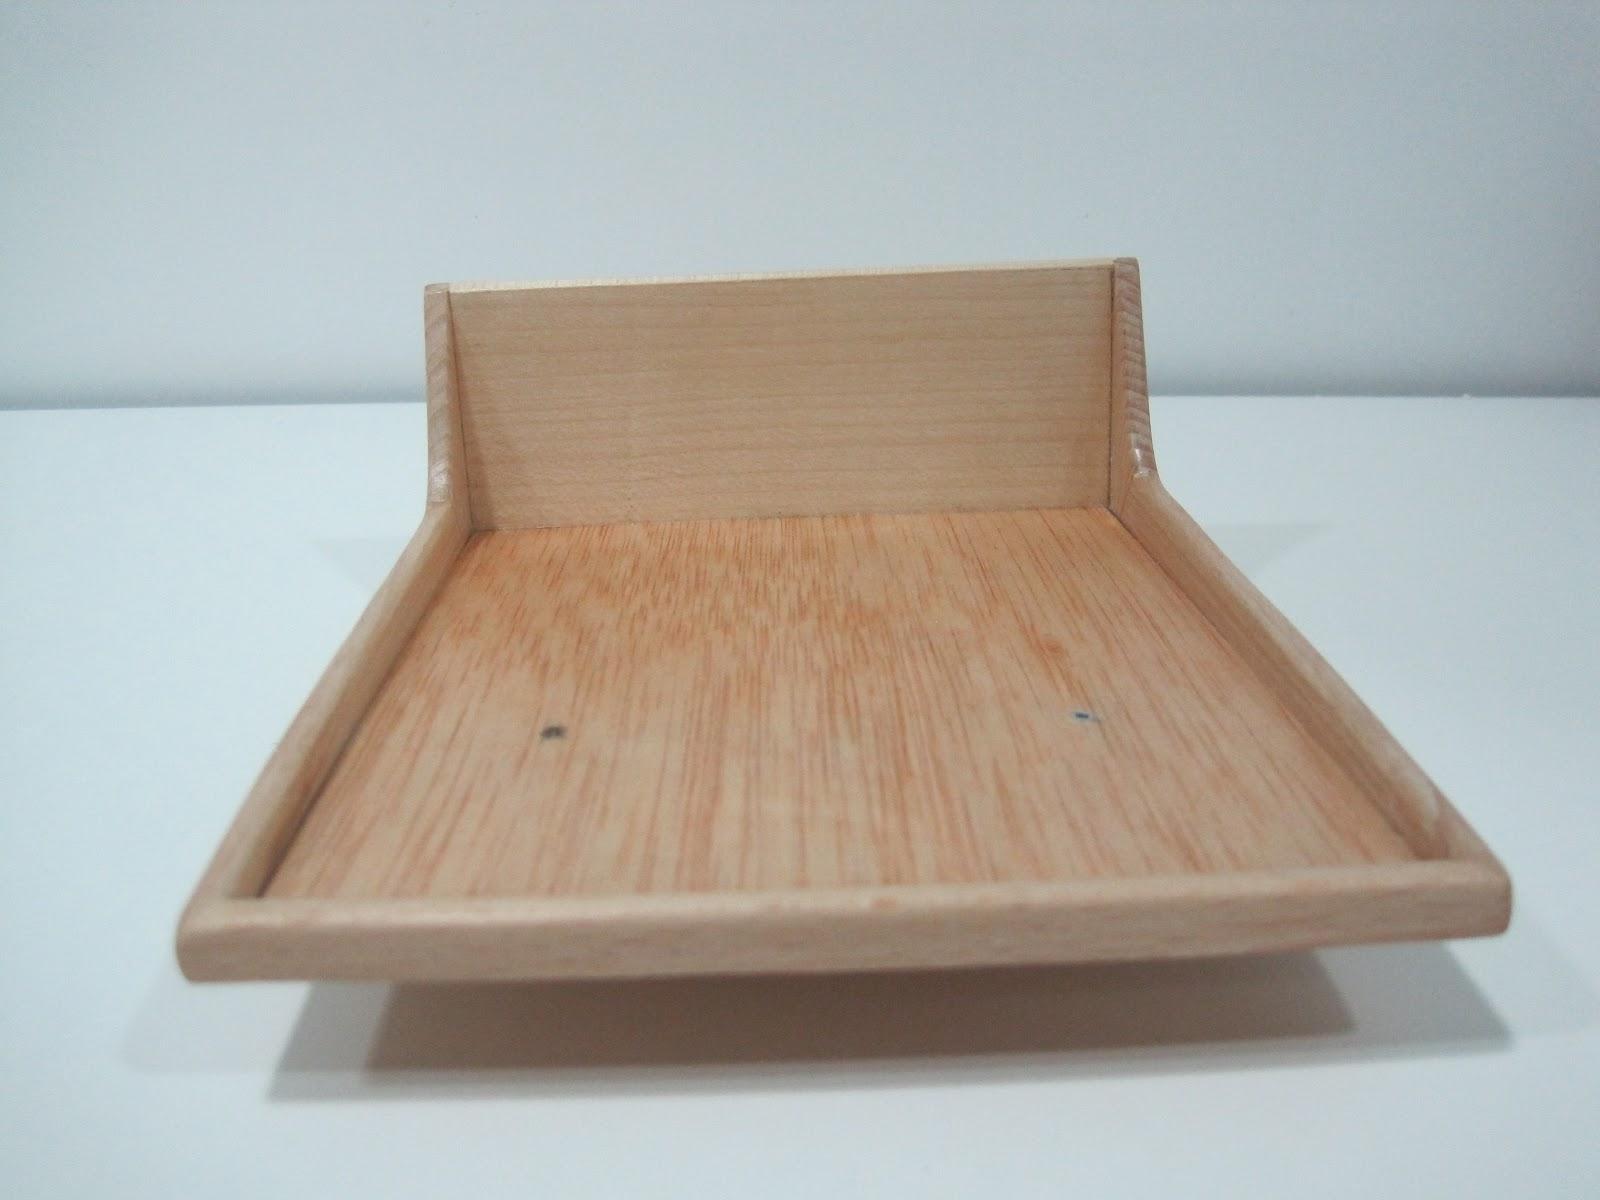 Madera en miniatura wooden miniatures cama 2 cama barco for Como reciclar una cama de madera